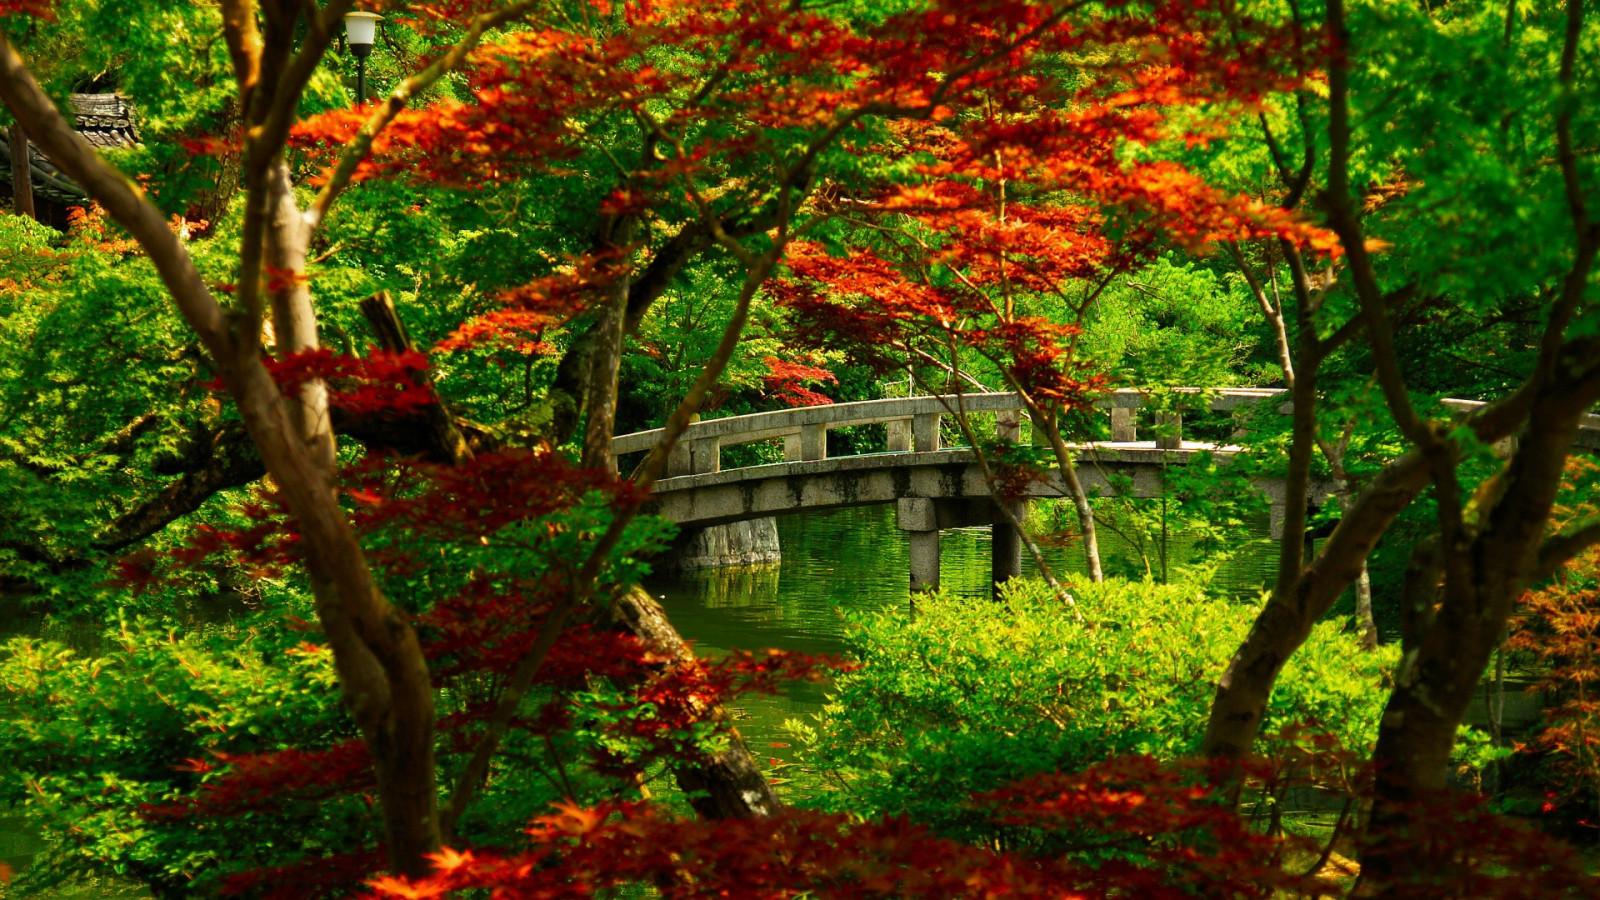 Fond d 39 cran for t la nature jungle rable japonais - Arbres a feuilles caduques ...